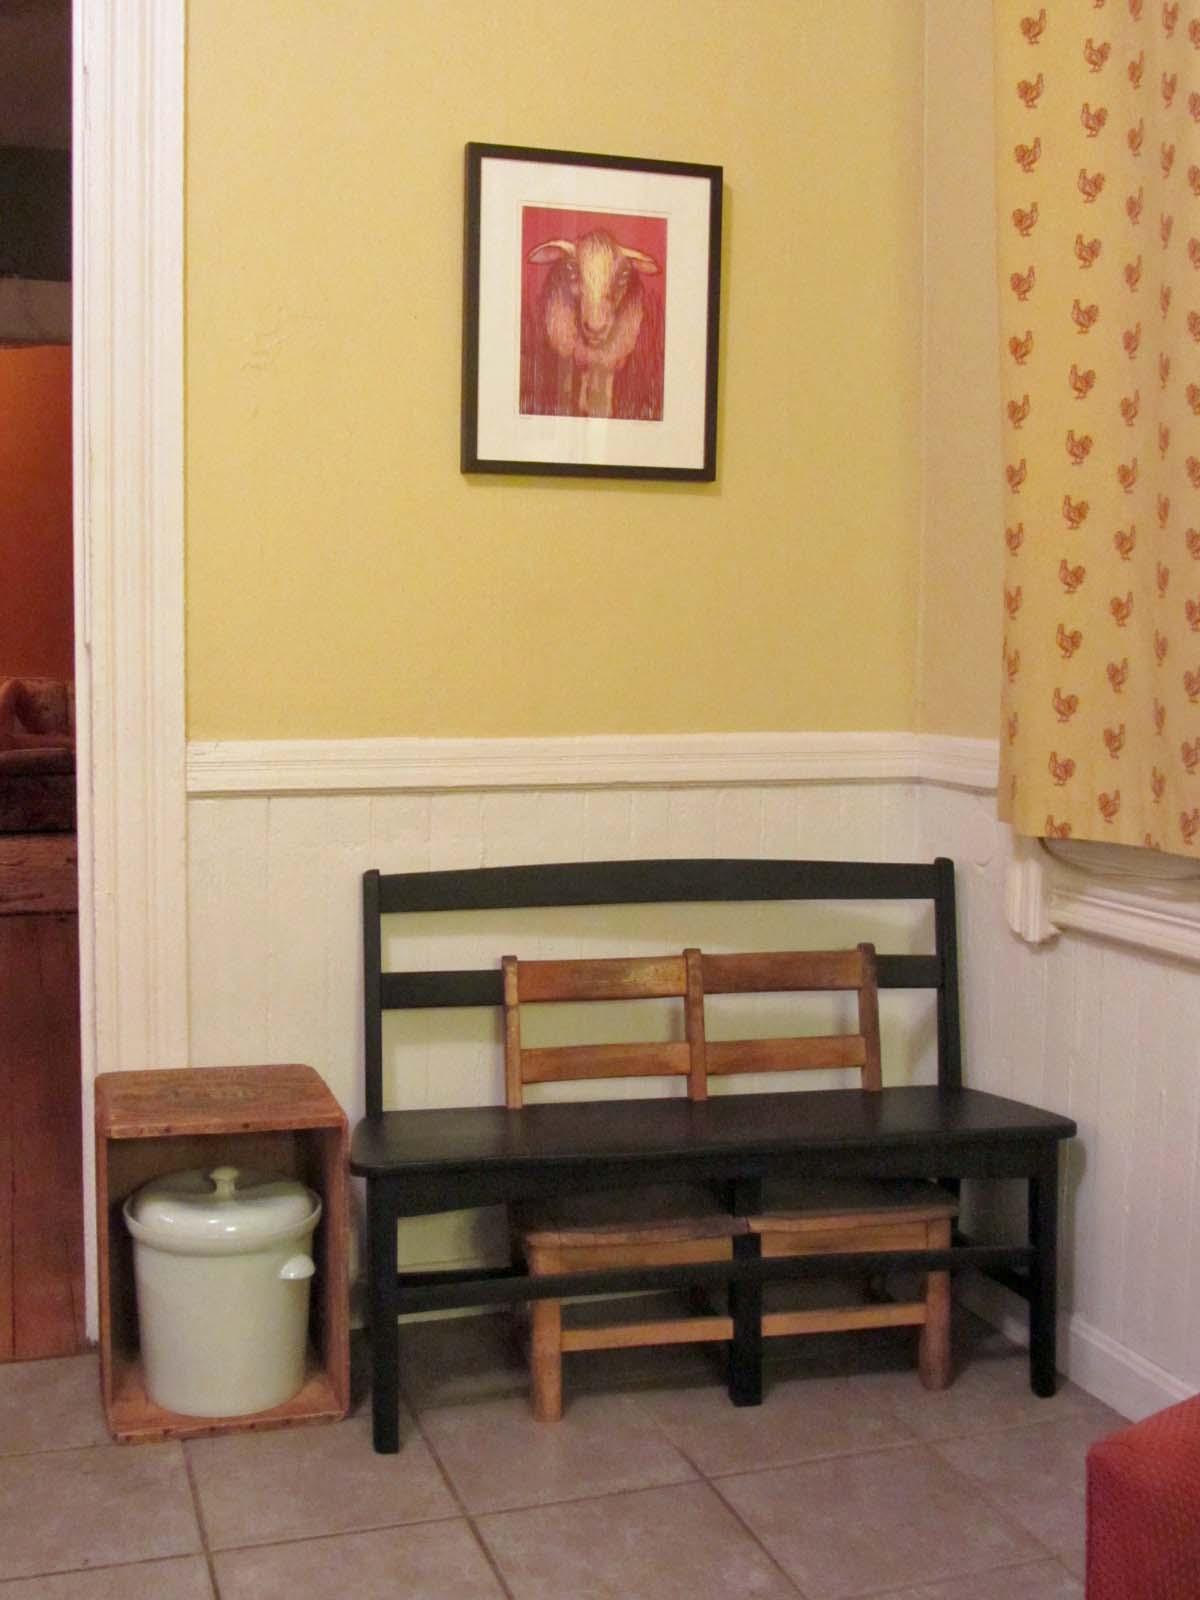 Tom Shields' bench, Ian Henderson's fermentation crock, Eleanor Annand's print